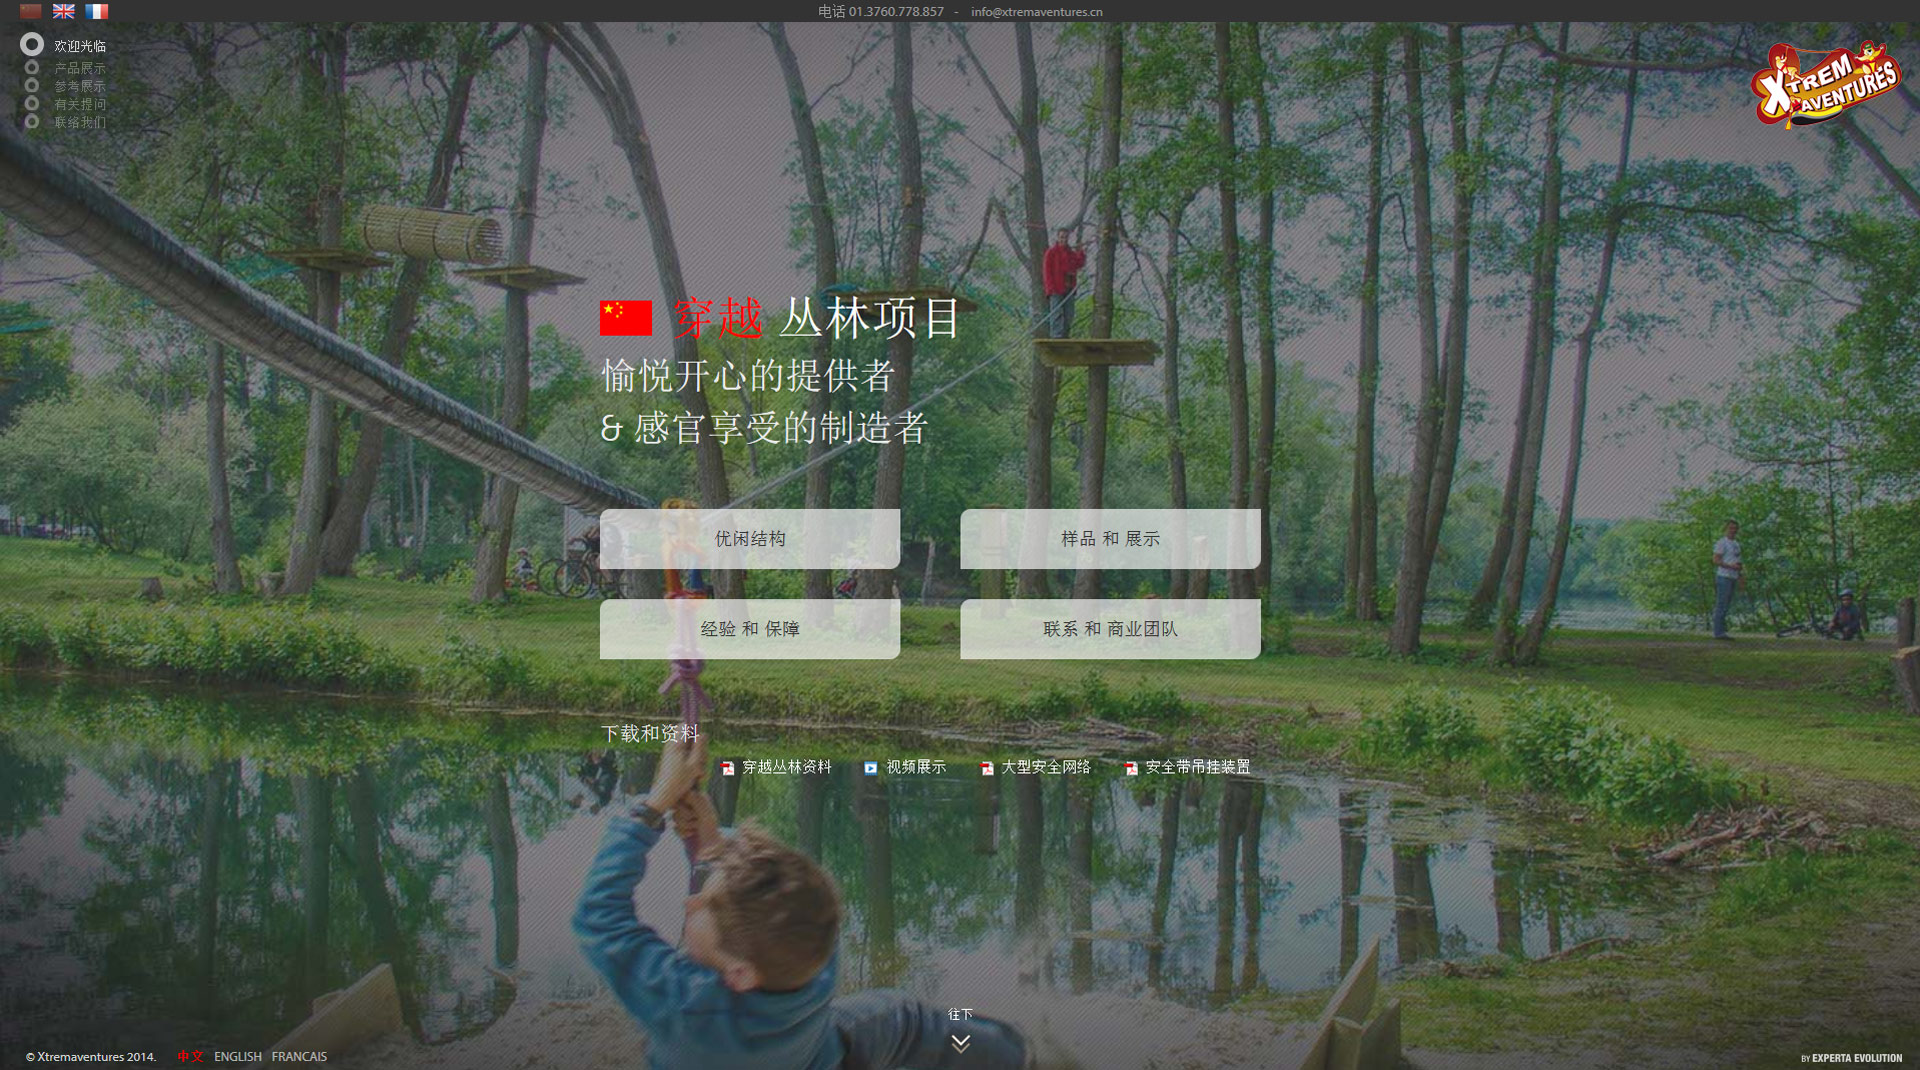 Site Internet Chinois XtremAventures